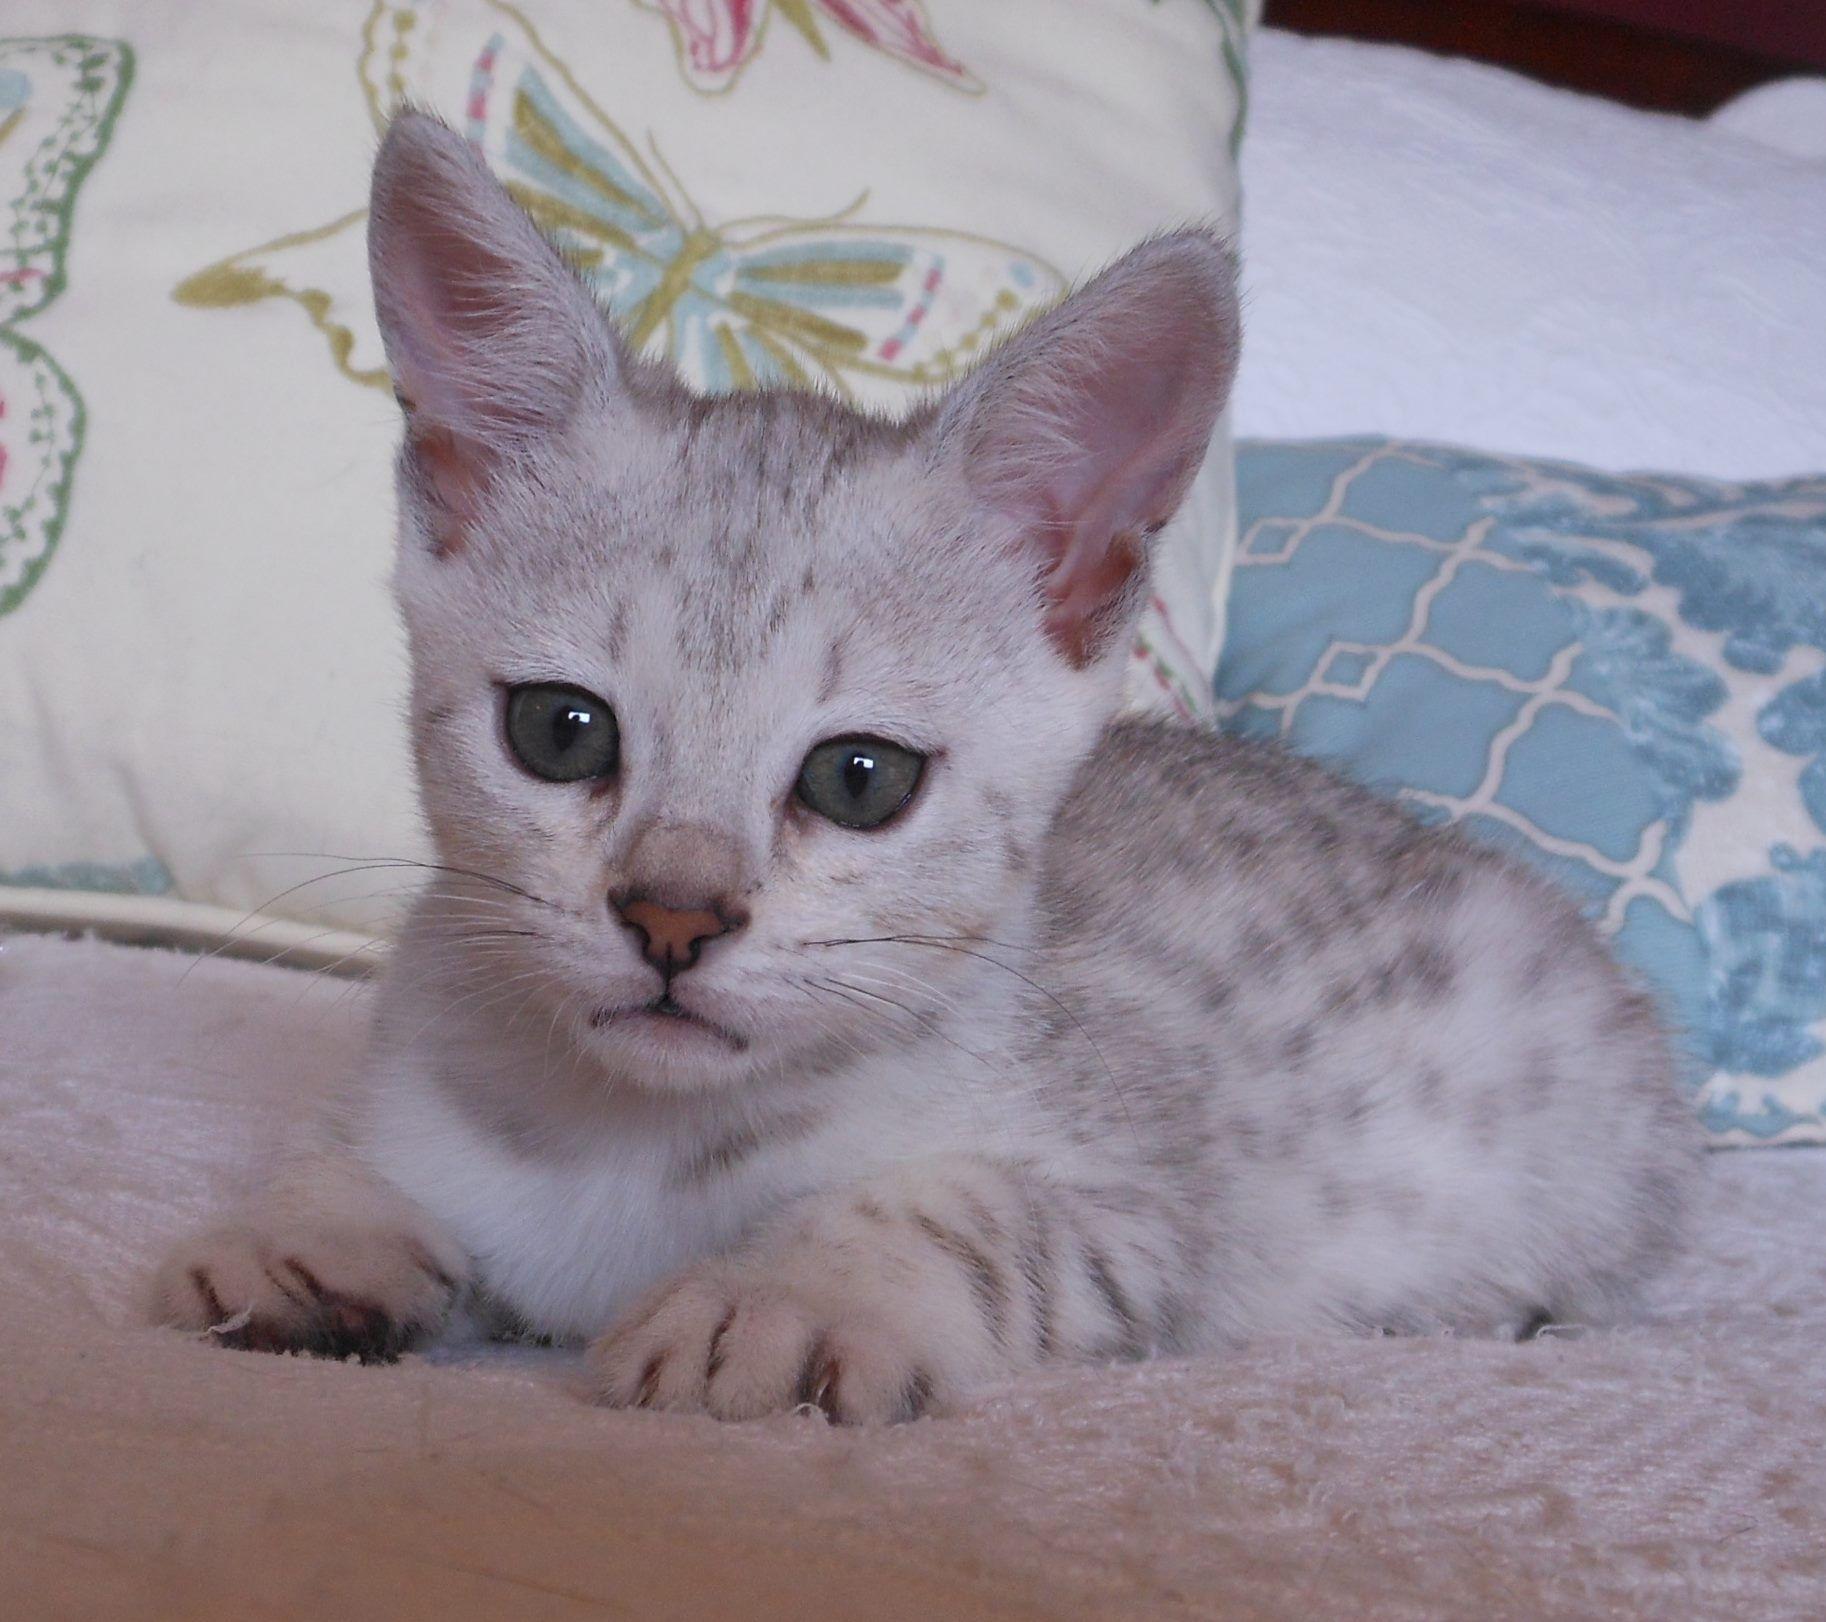 8 week old.... F4 Savannah Kitten... This a BEAUTIFUL